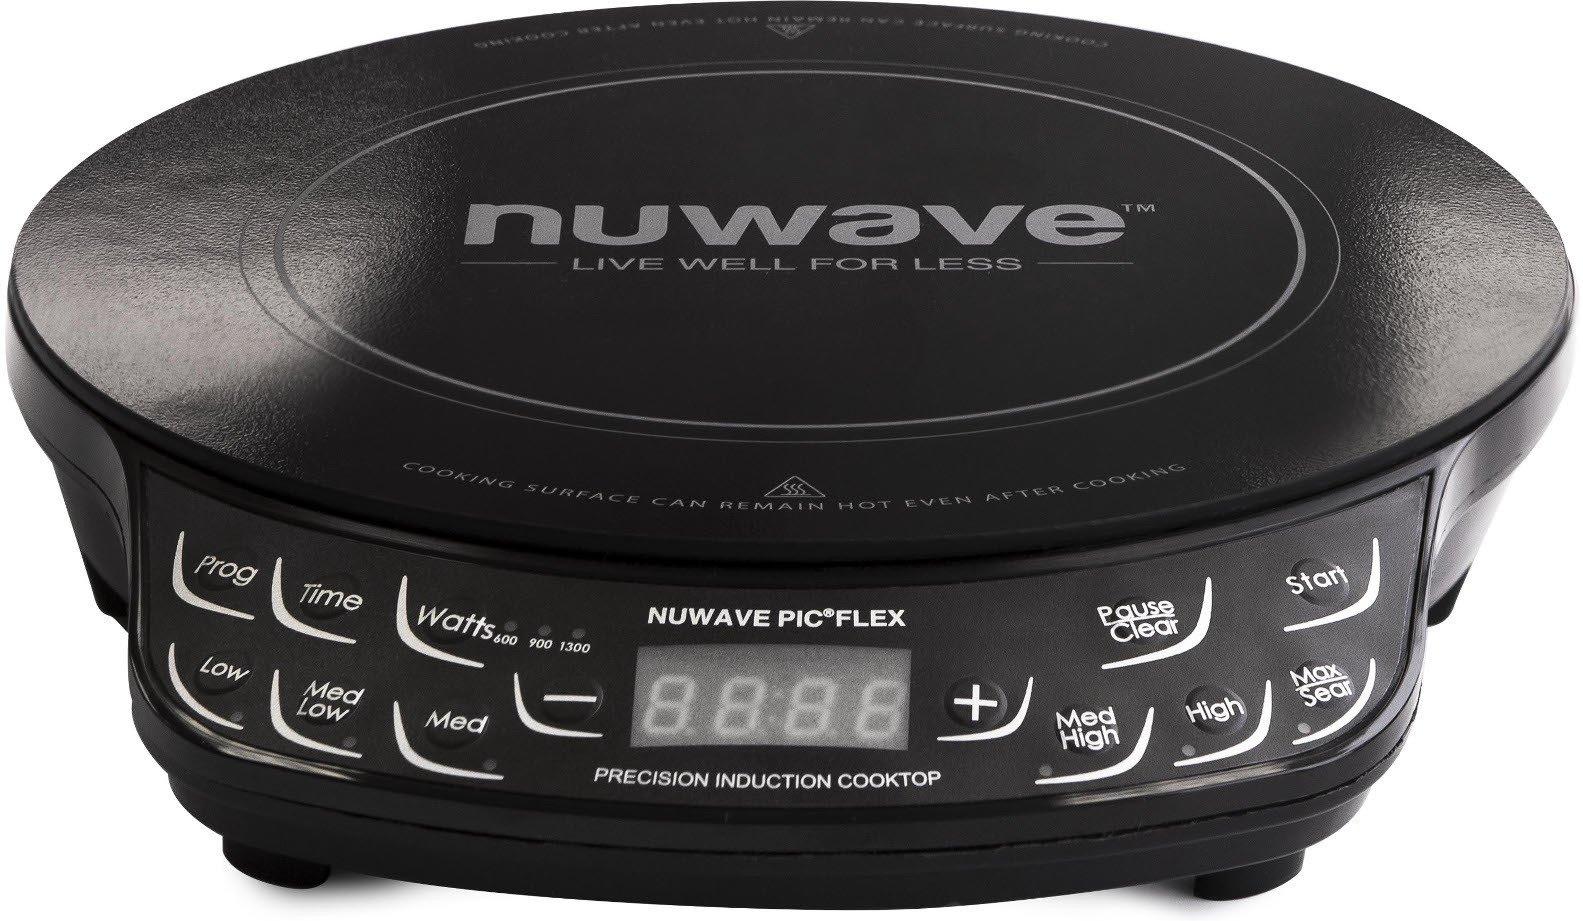 Nuwave PIC FLEX Precison Cooktop